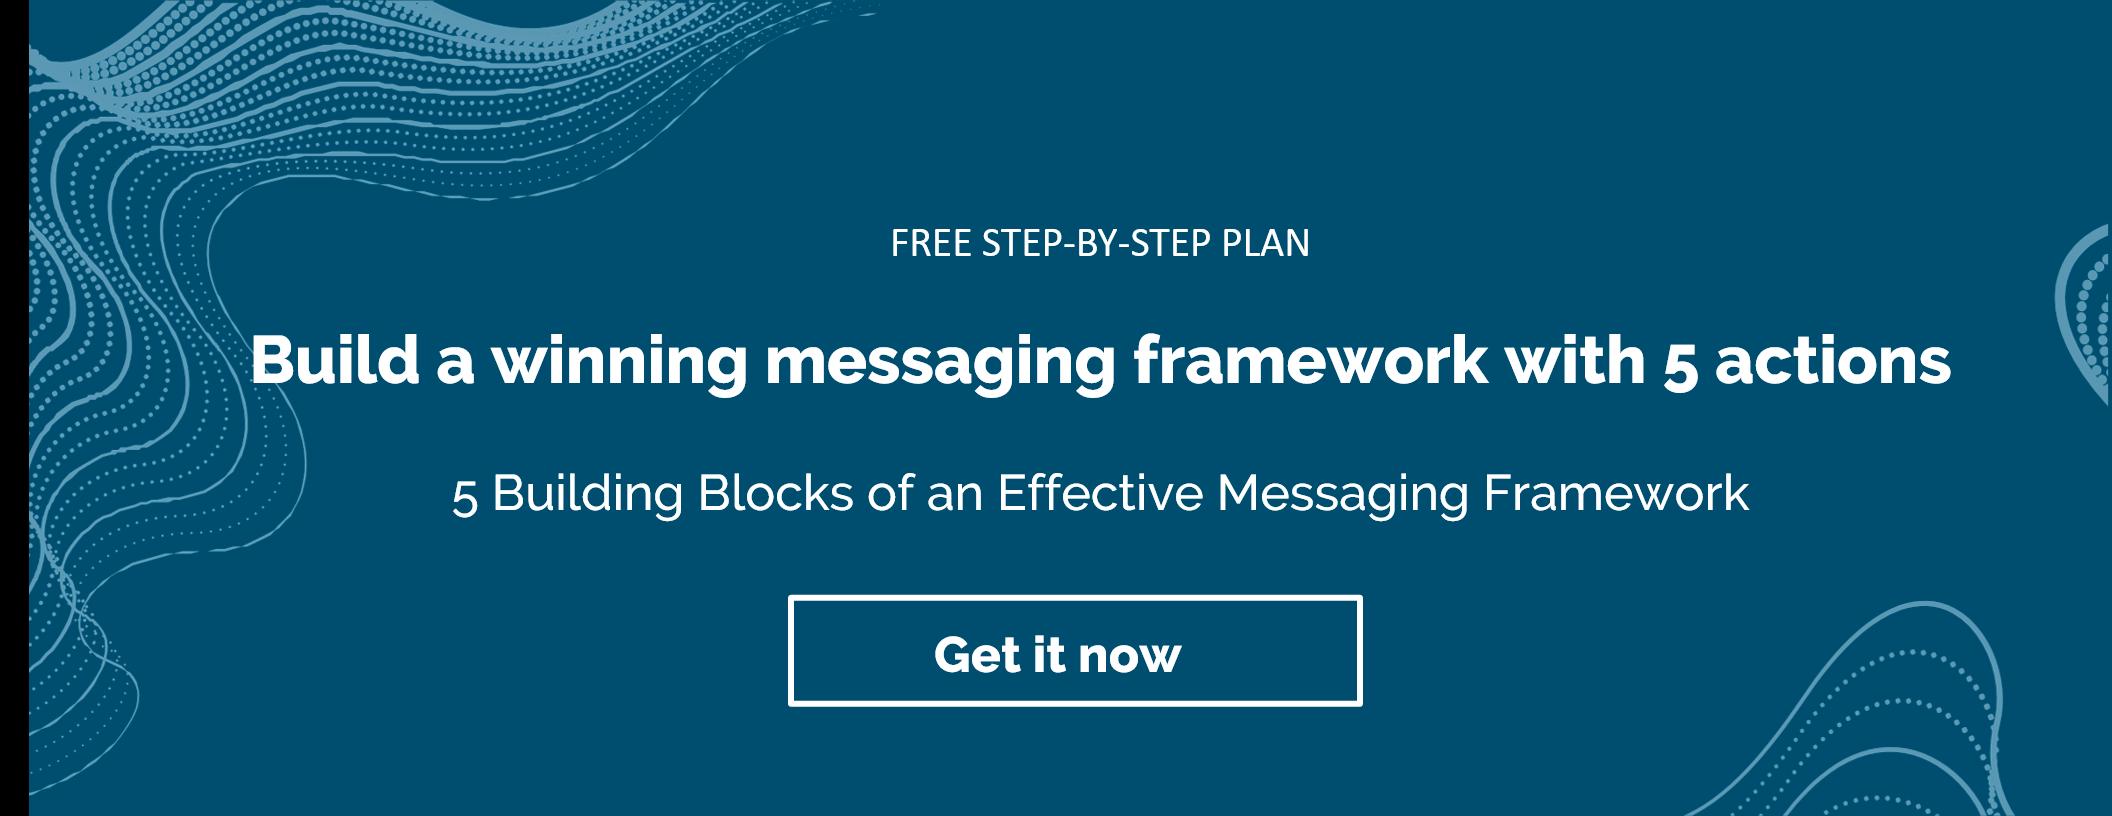 messaging framework_cta